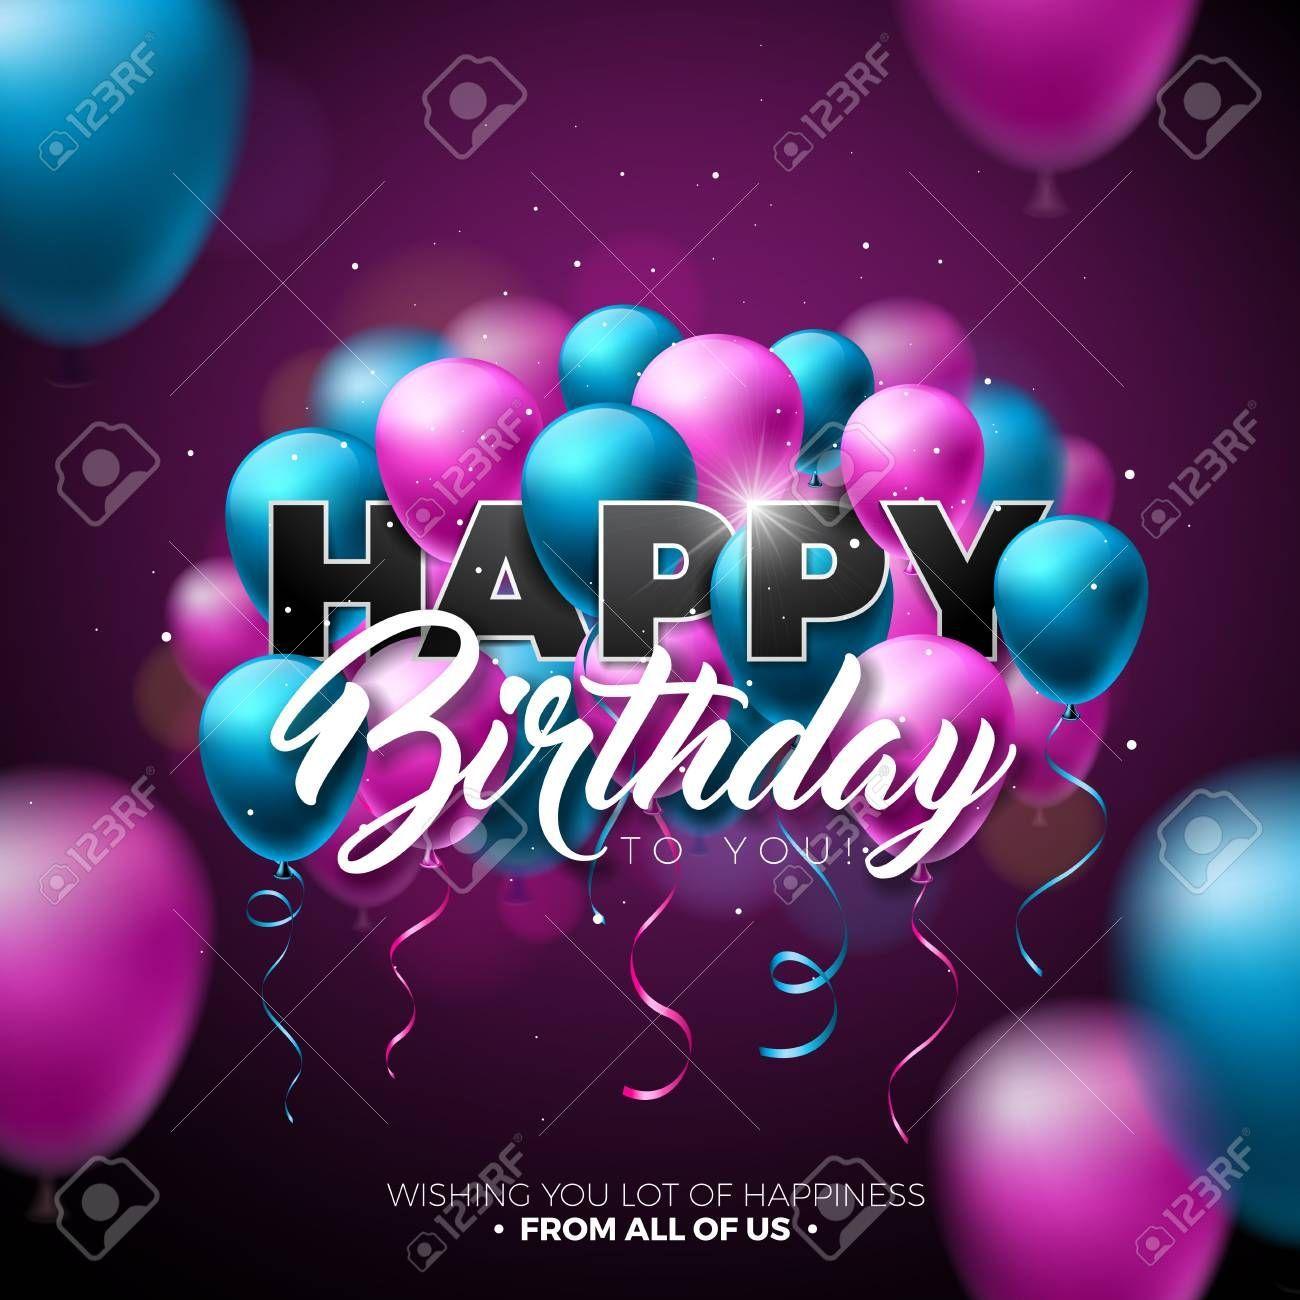 Happy Birthday Vector Design With Balloon Typography And 3d Element On Shiny Ba Happy Birthday Design Birthday Design Birthday Vector